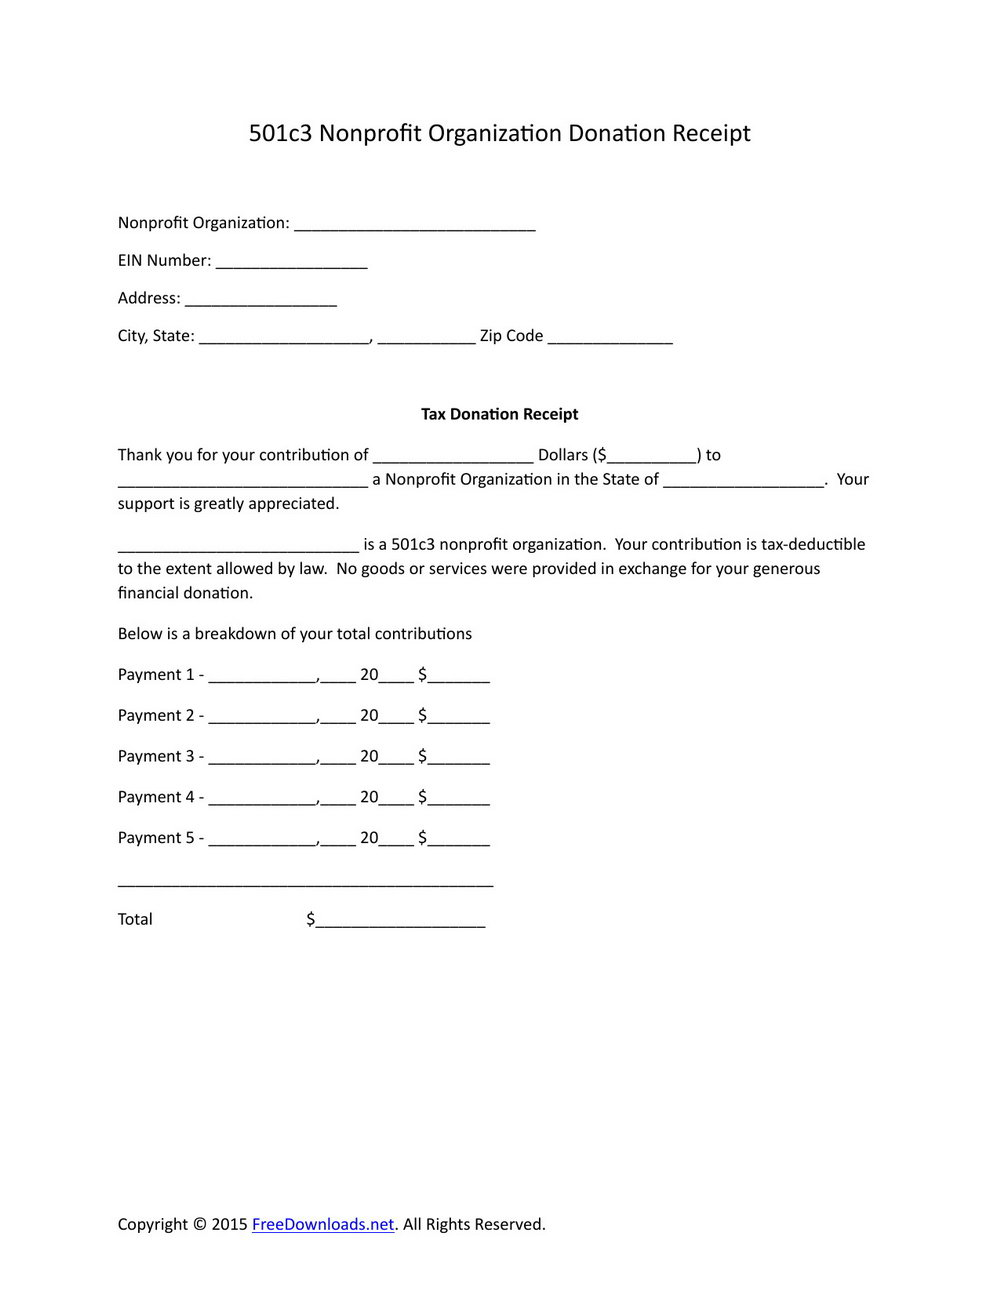 Non Profit Organization Donation Receipt Template